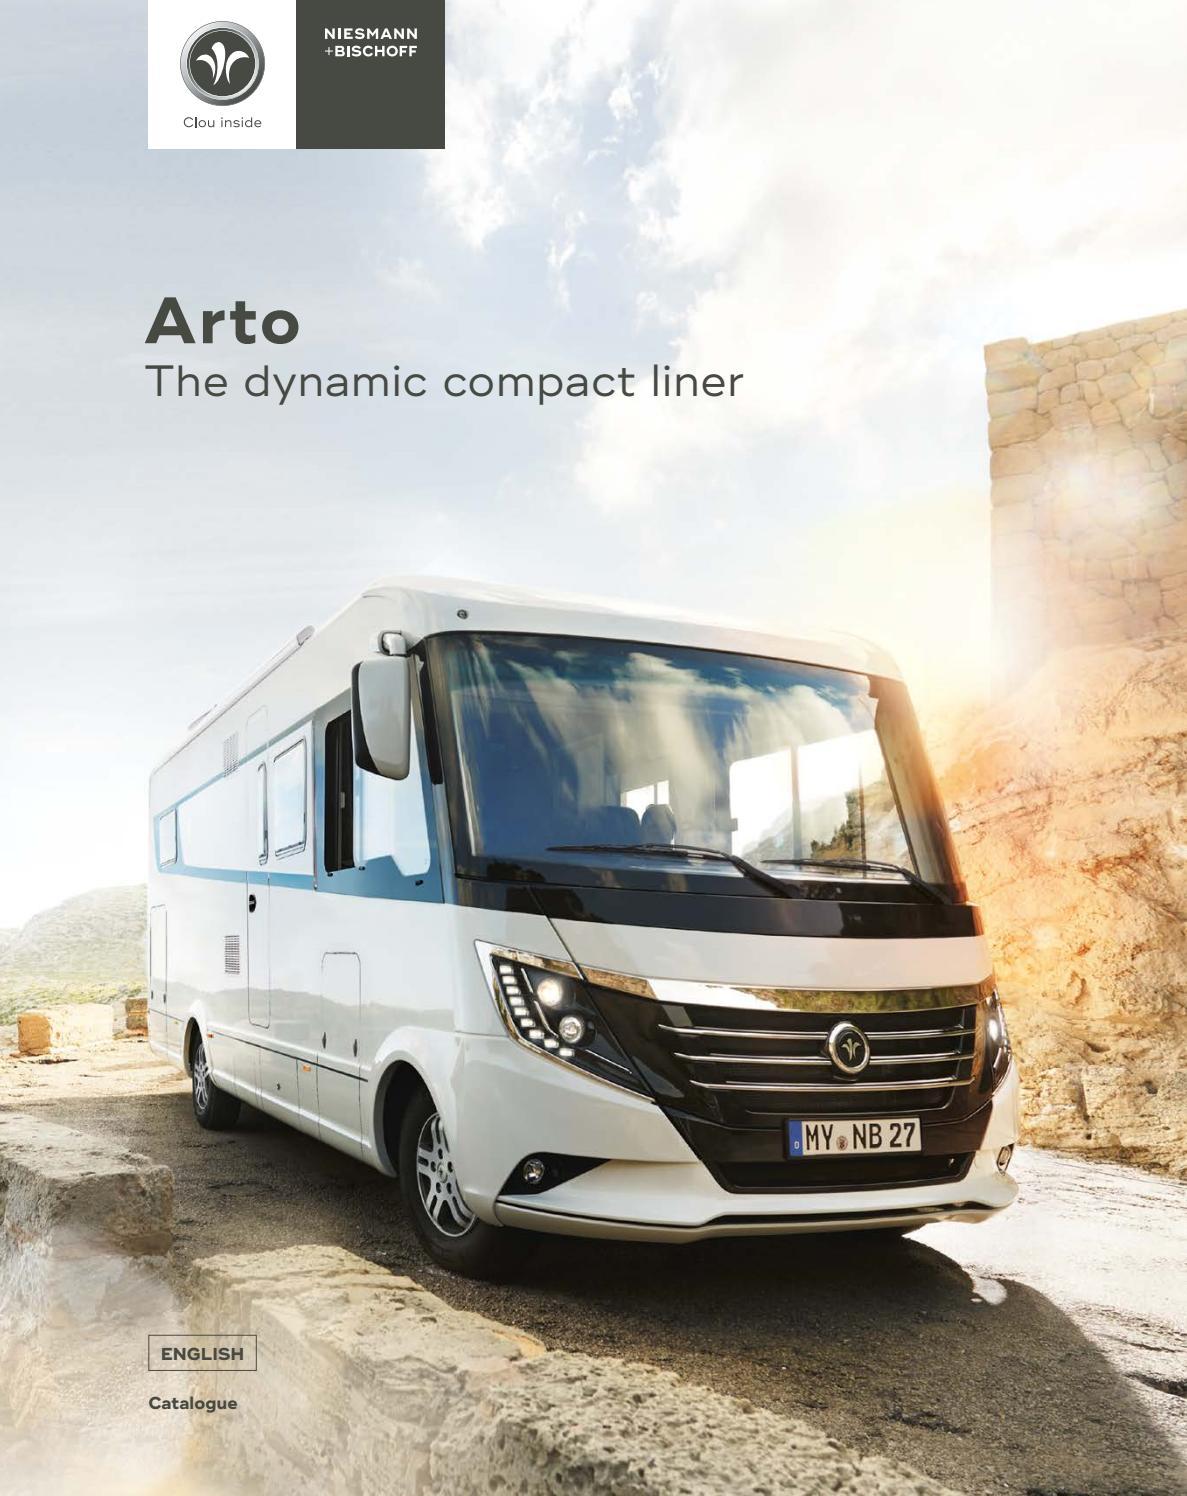 Nb Arto Katalog Gb By Tibe Issuu To Fix No Communication Bus Wiring Problems For 2004 Mazda Vehicles